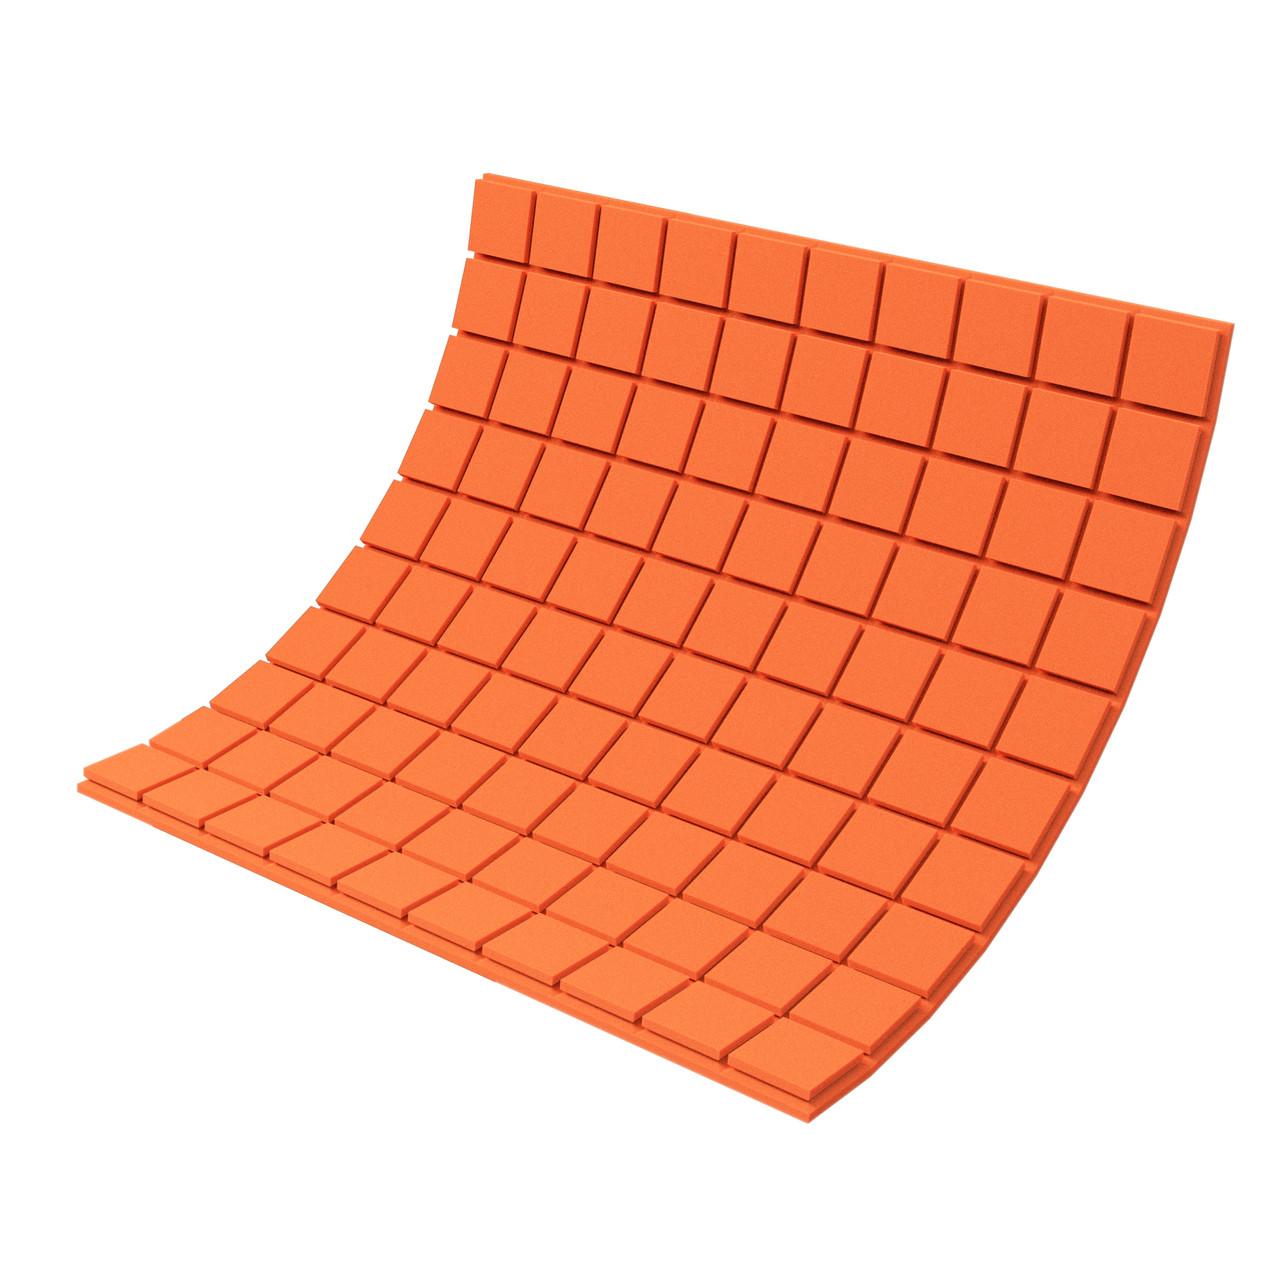 Панель з акустичного поролону Ecosound Tetras Color товщиною 30 мм, розміром 100х100 см, оранжевого кольору